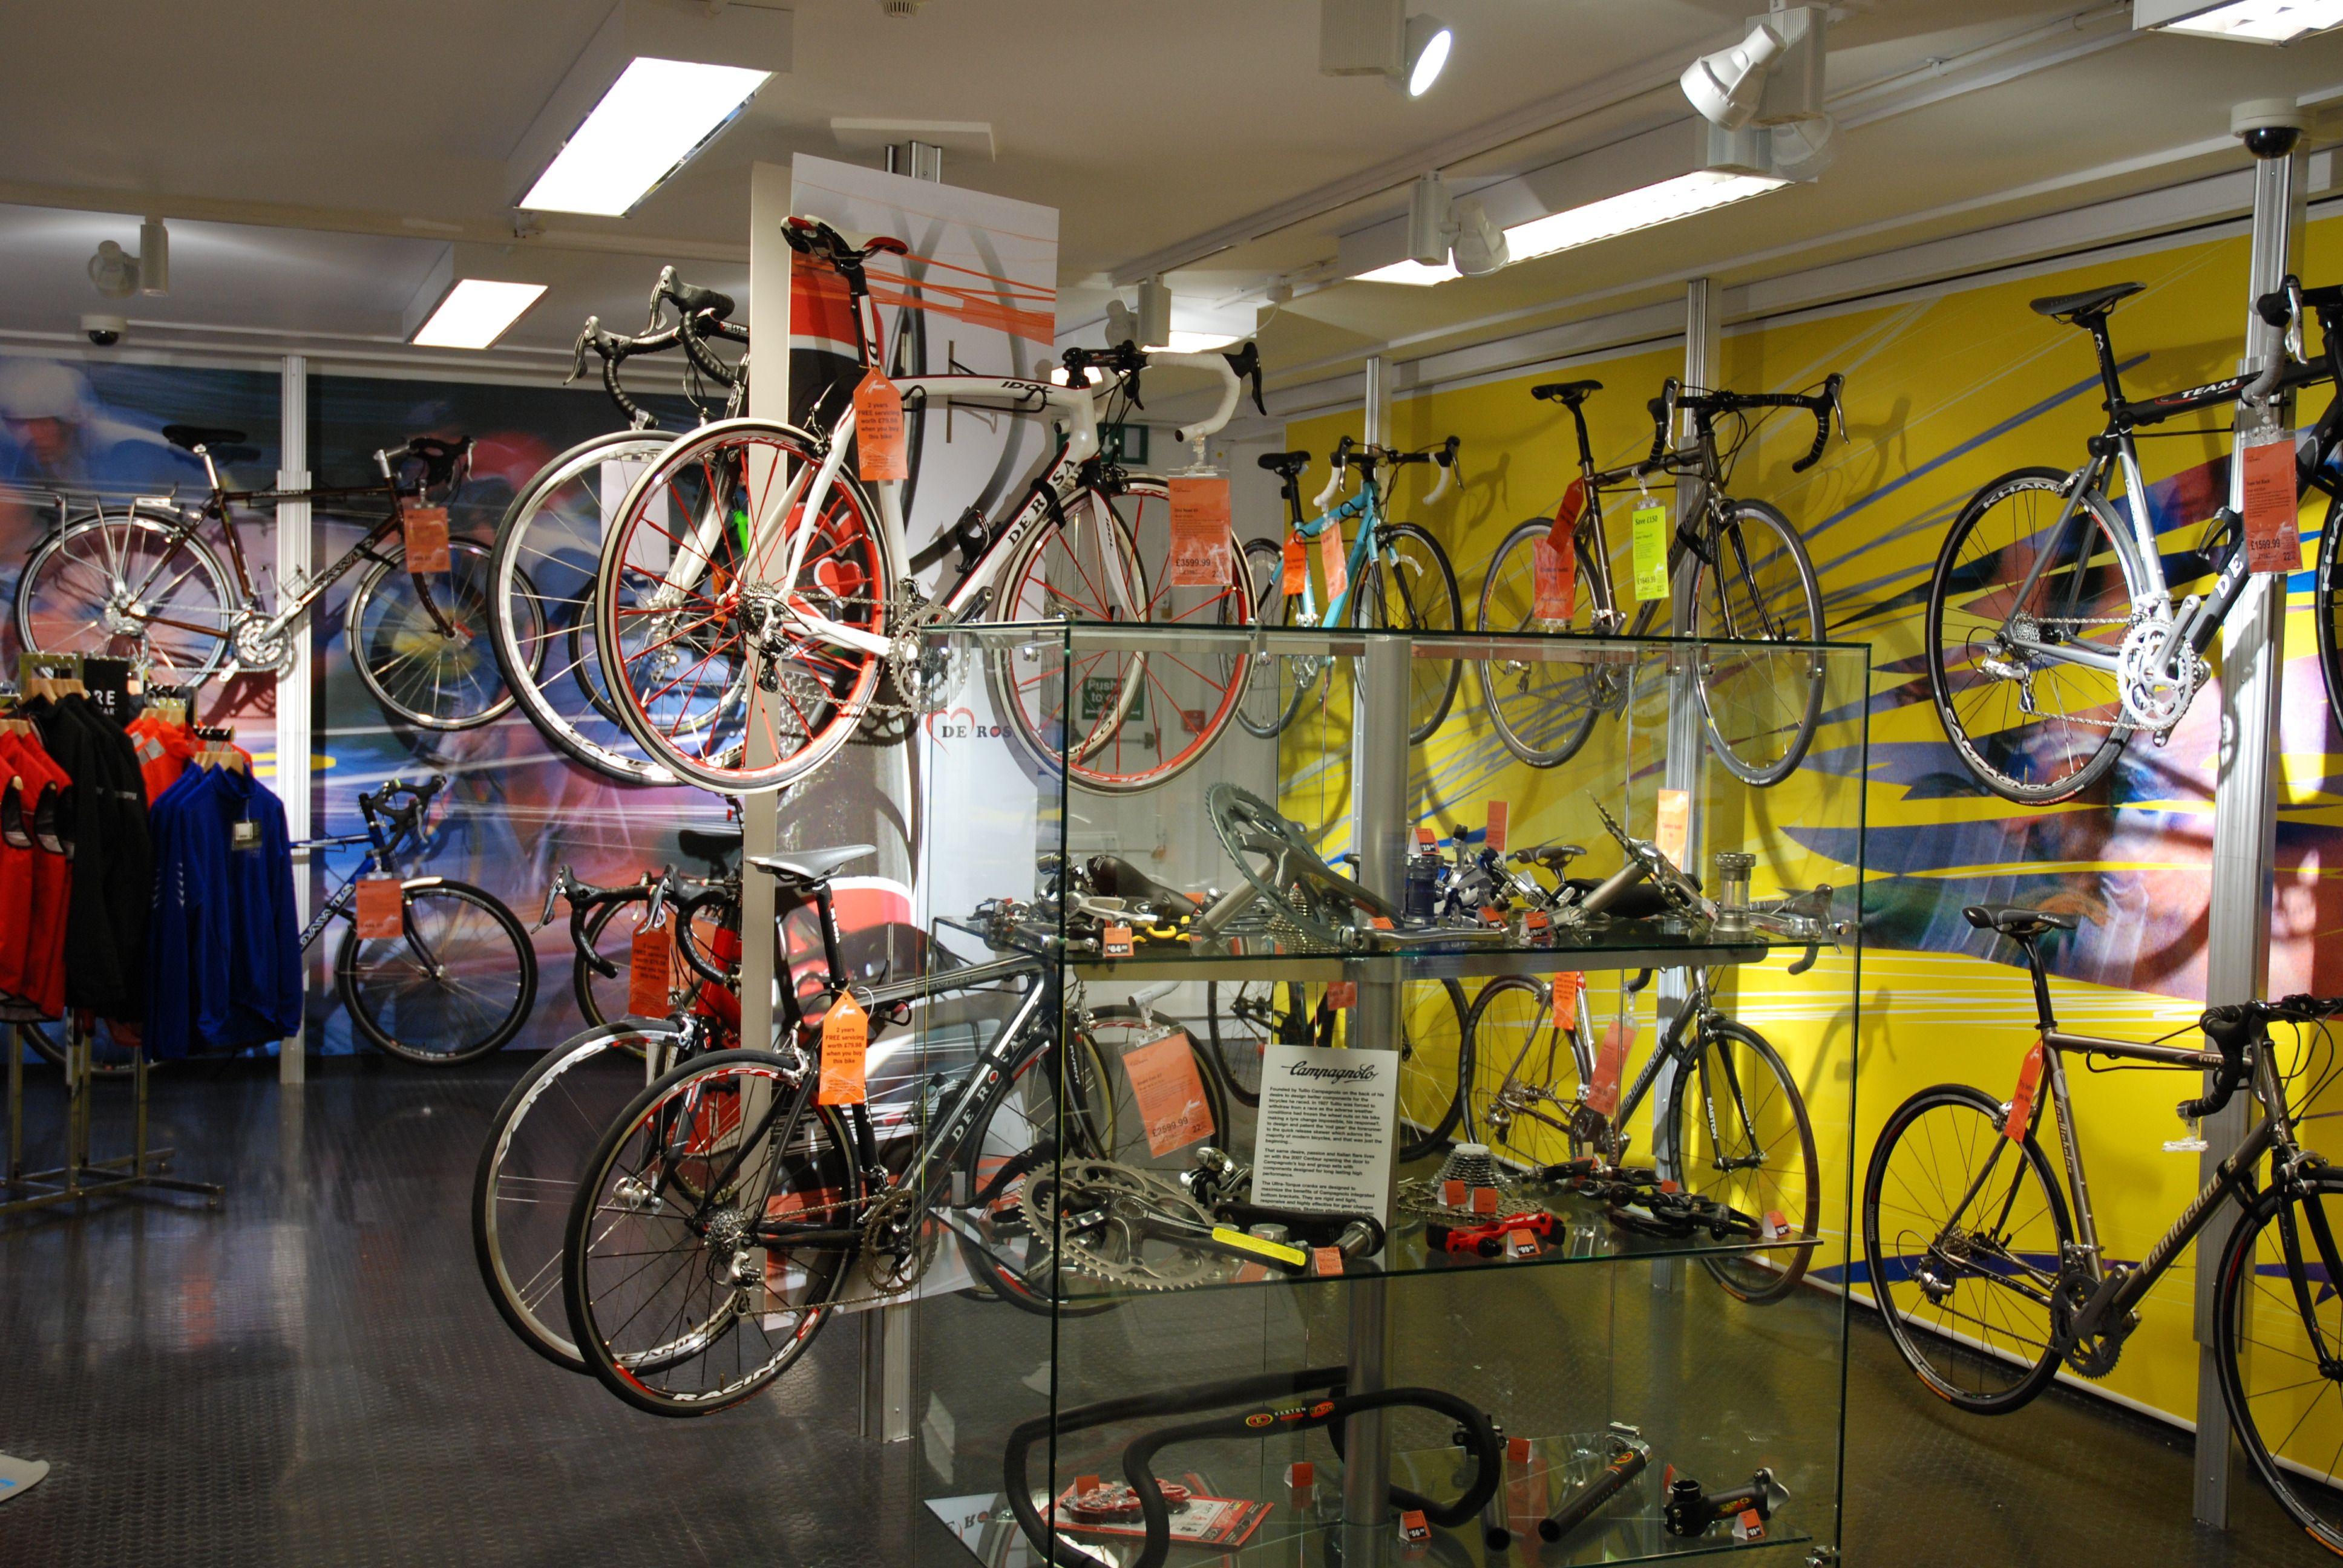 Halfords Bike Hut Interiors Productdisplay Bikes Cycling Bike Stationary Bike Design Projects